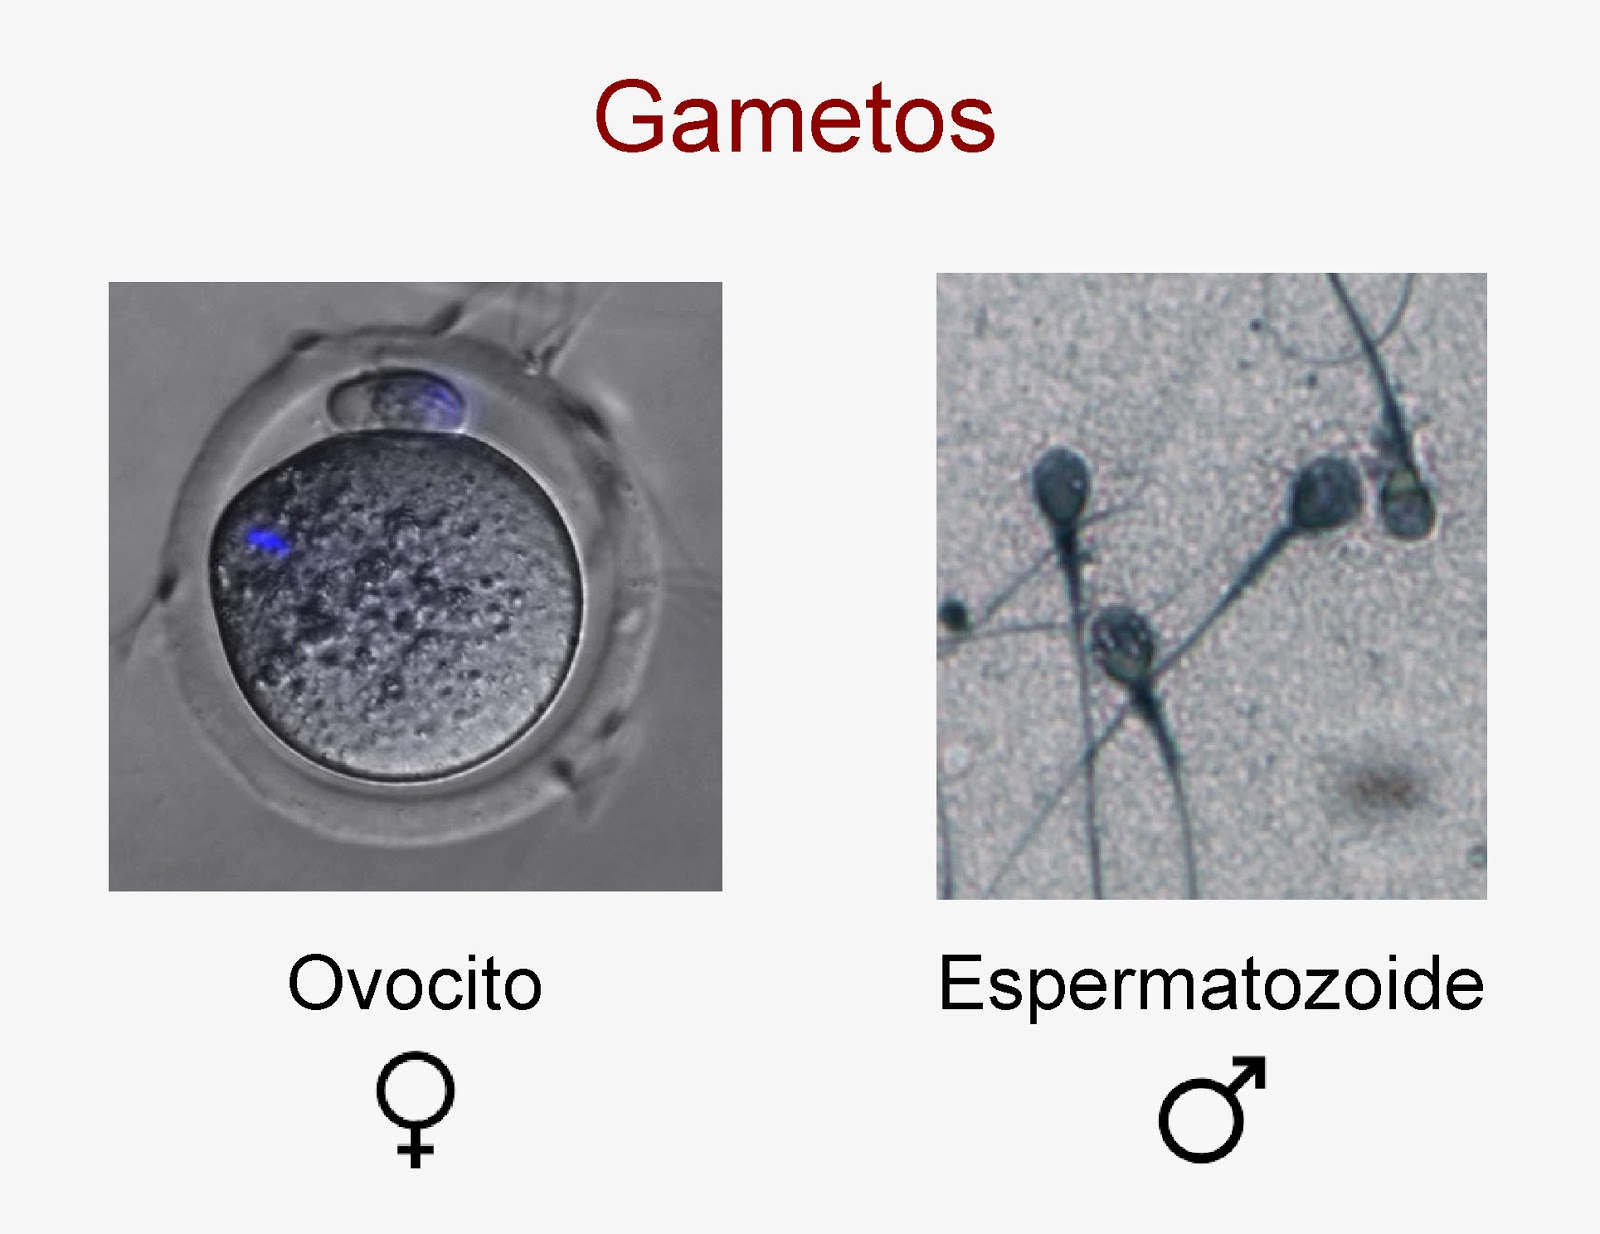 Ovocito y espermatozoide